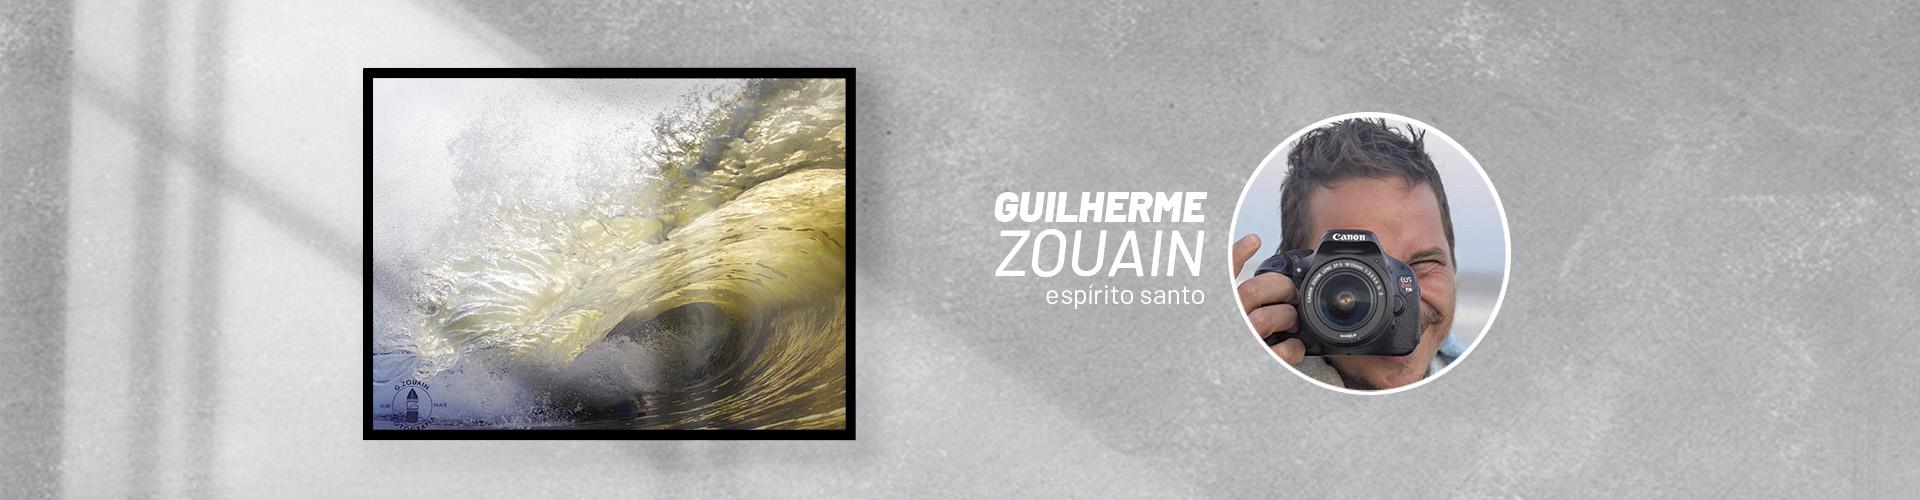 Página Artista | Guilherme Zouain